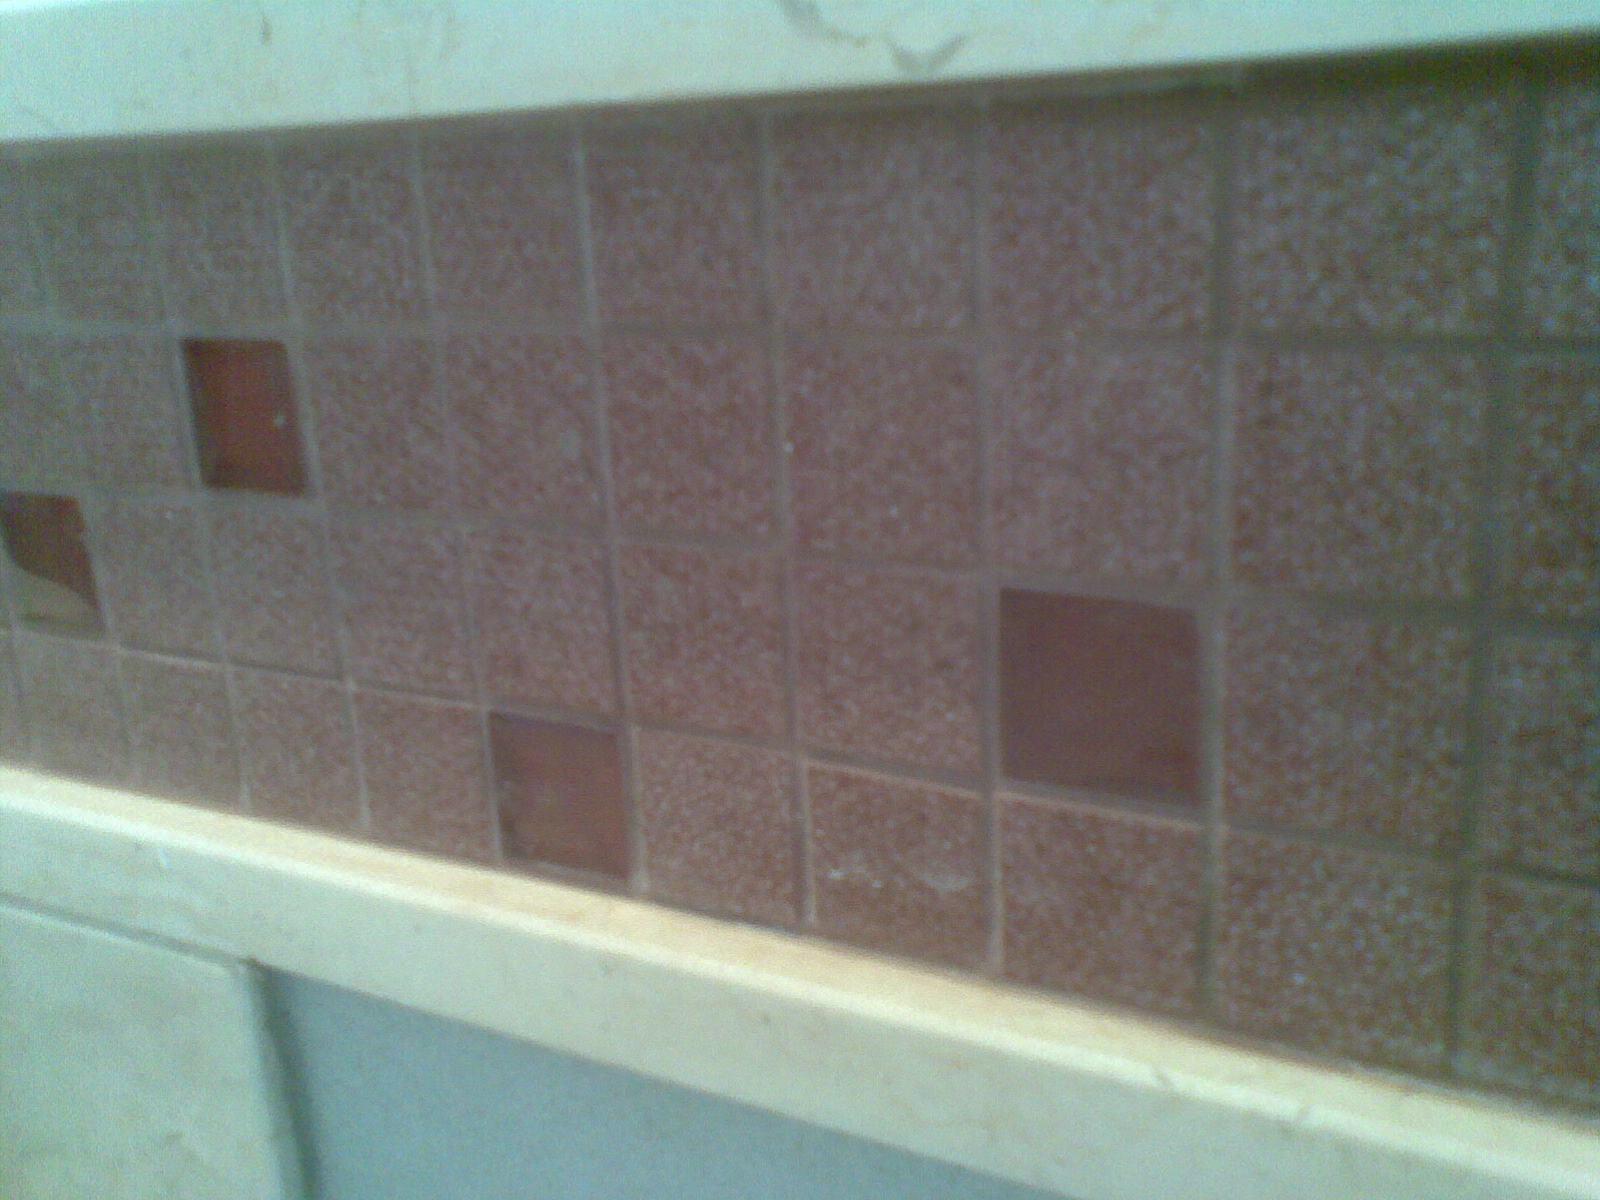 Imagens de #4D7E72  portinari que complementa o revestimento do banheiro do casal 1600x1200 px 2578 Box Banheiro Uberaba